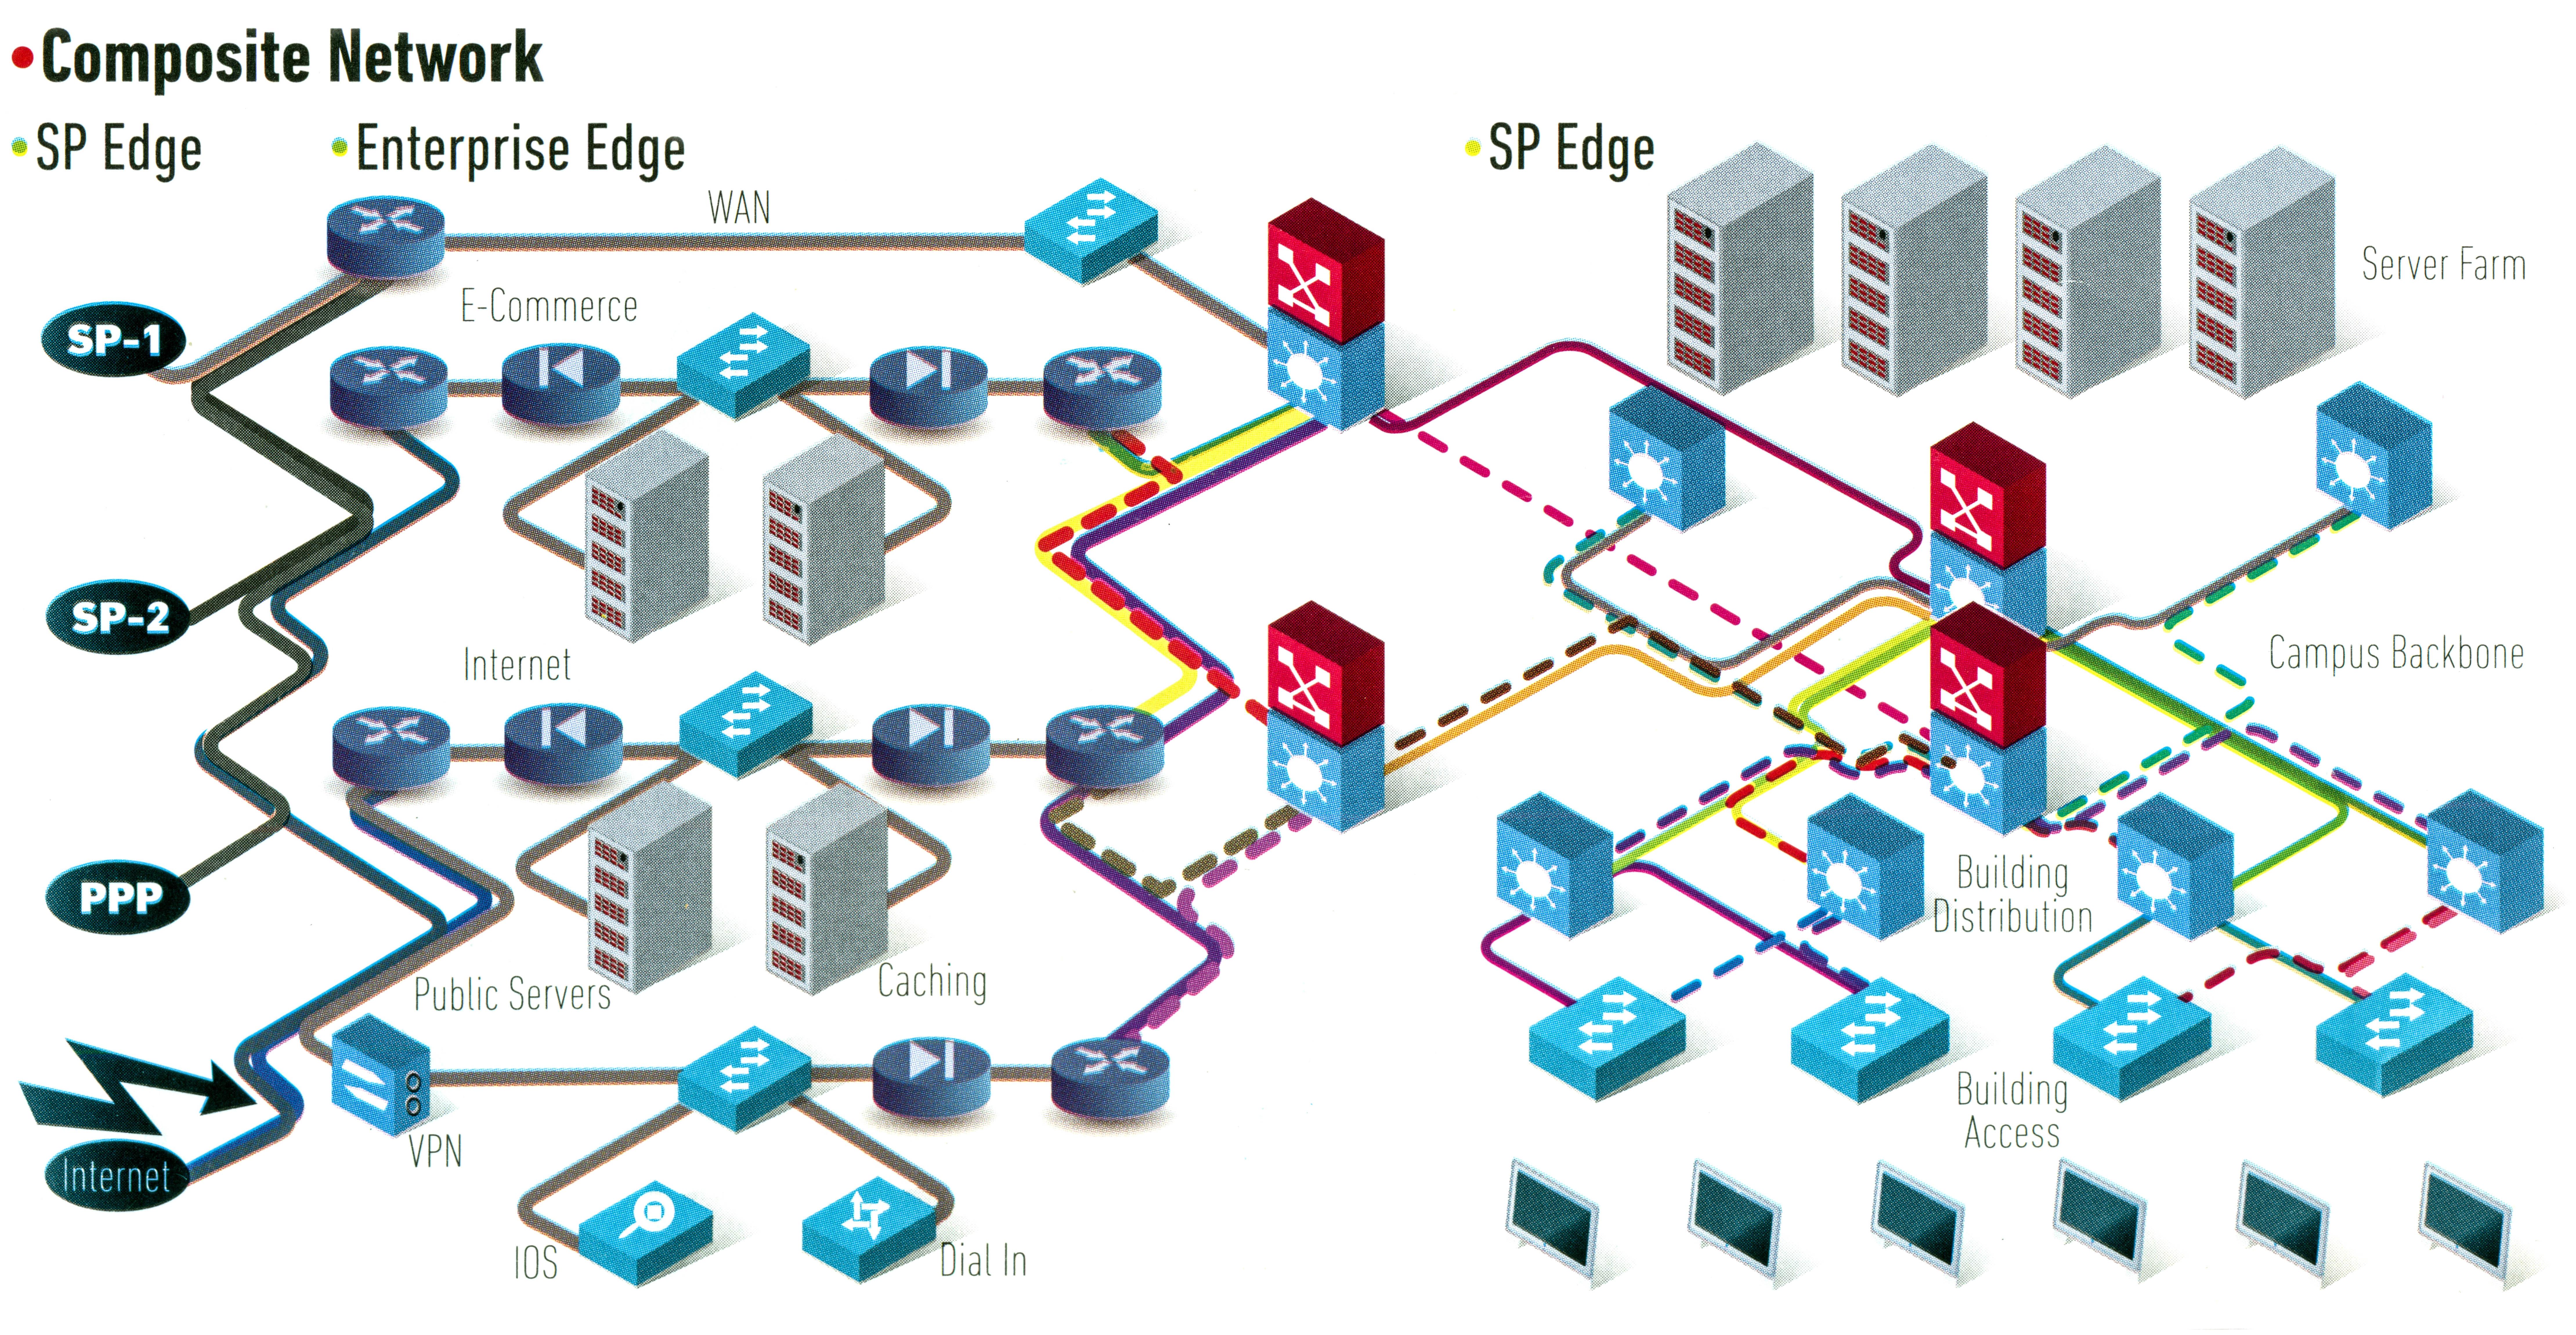 Composite Network